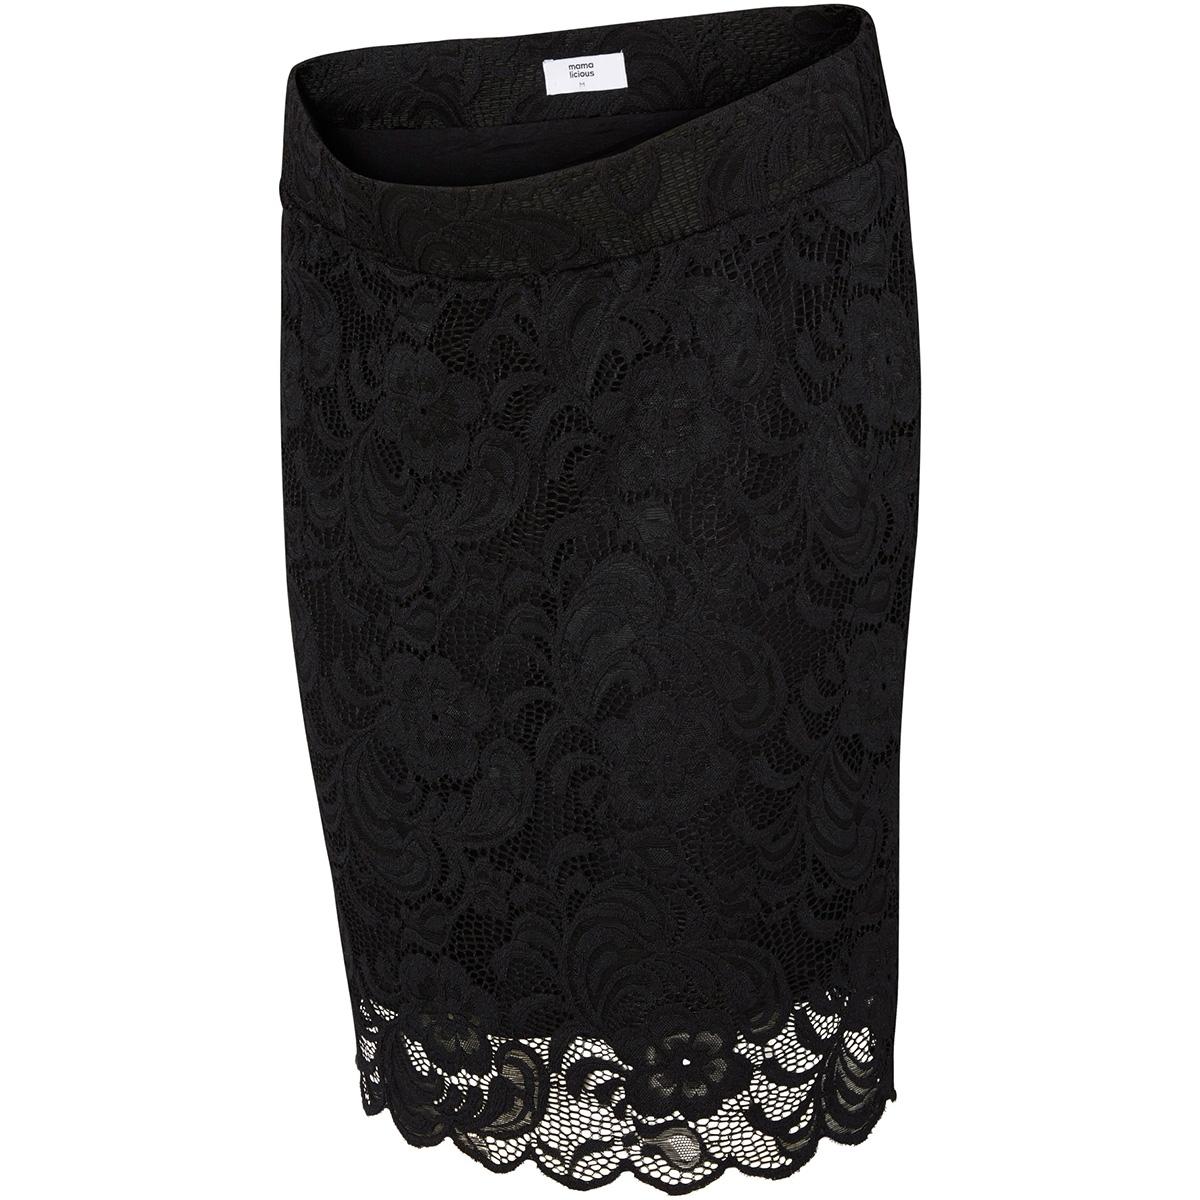 mlmivana woven skirt 20007217 mama-licious positie rok black